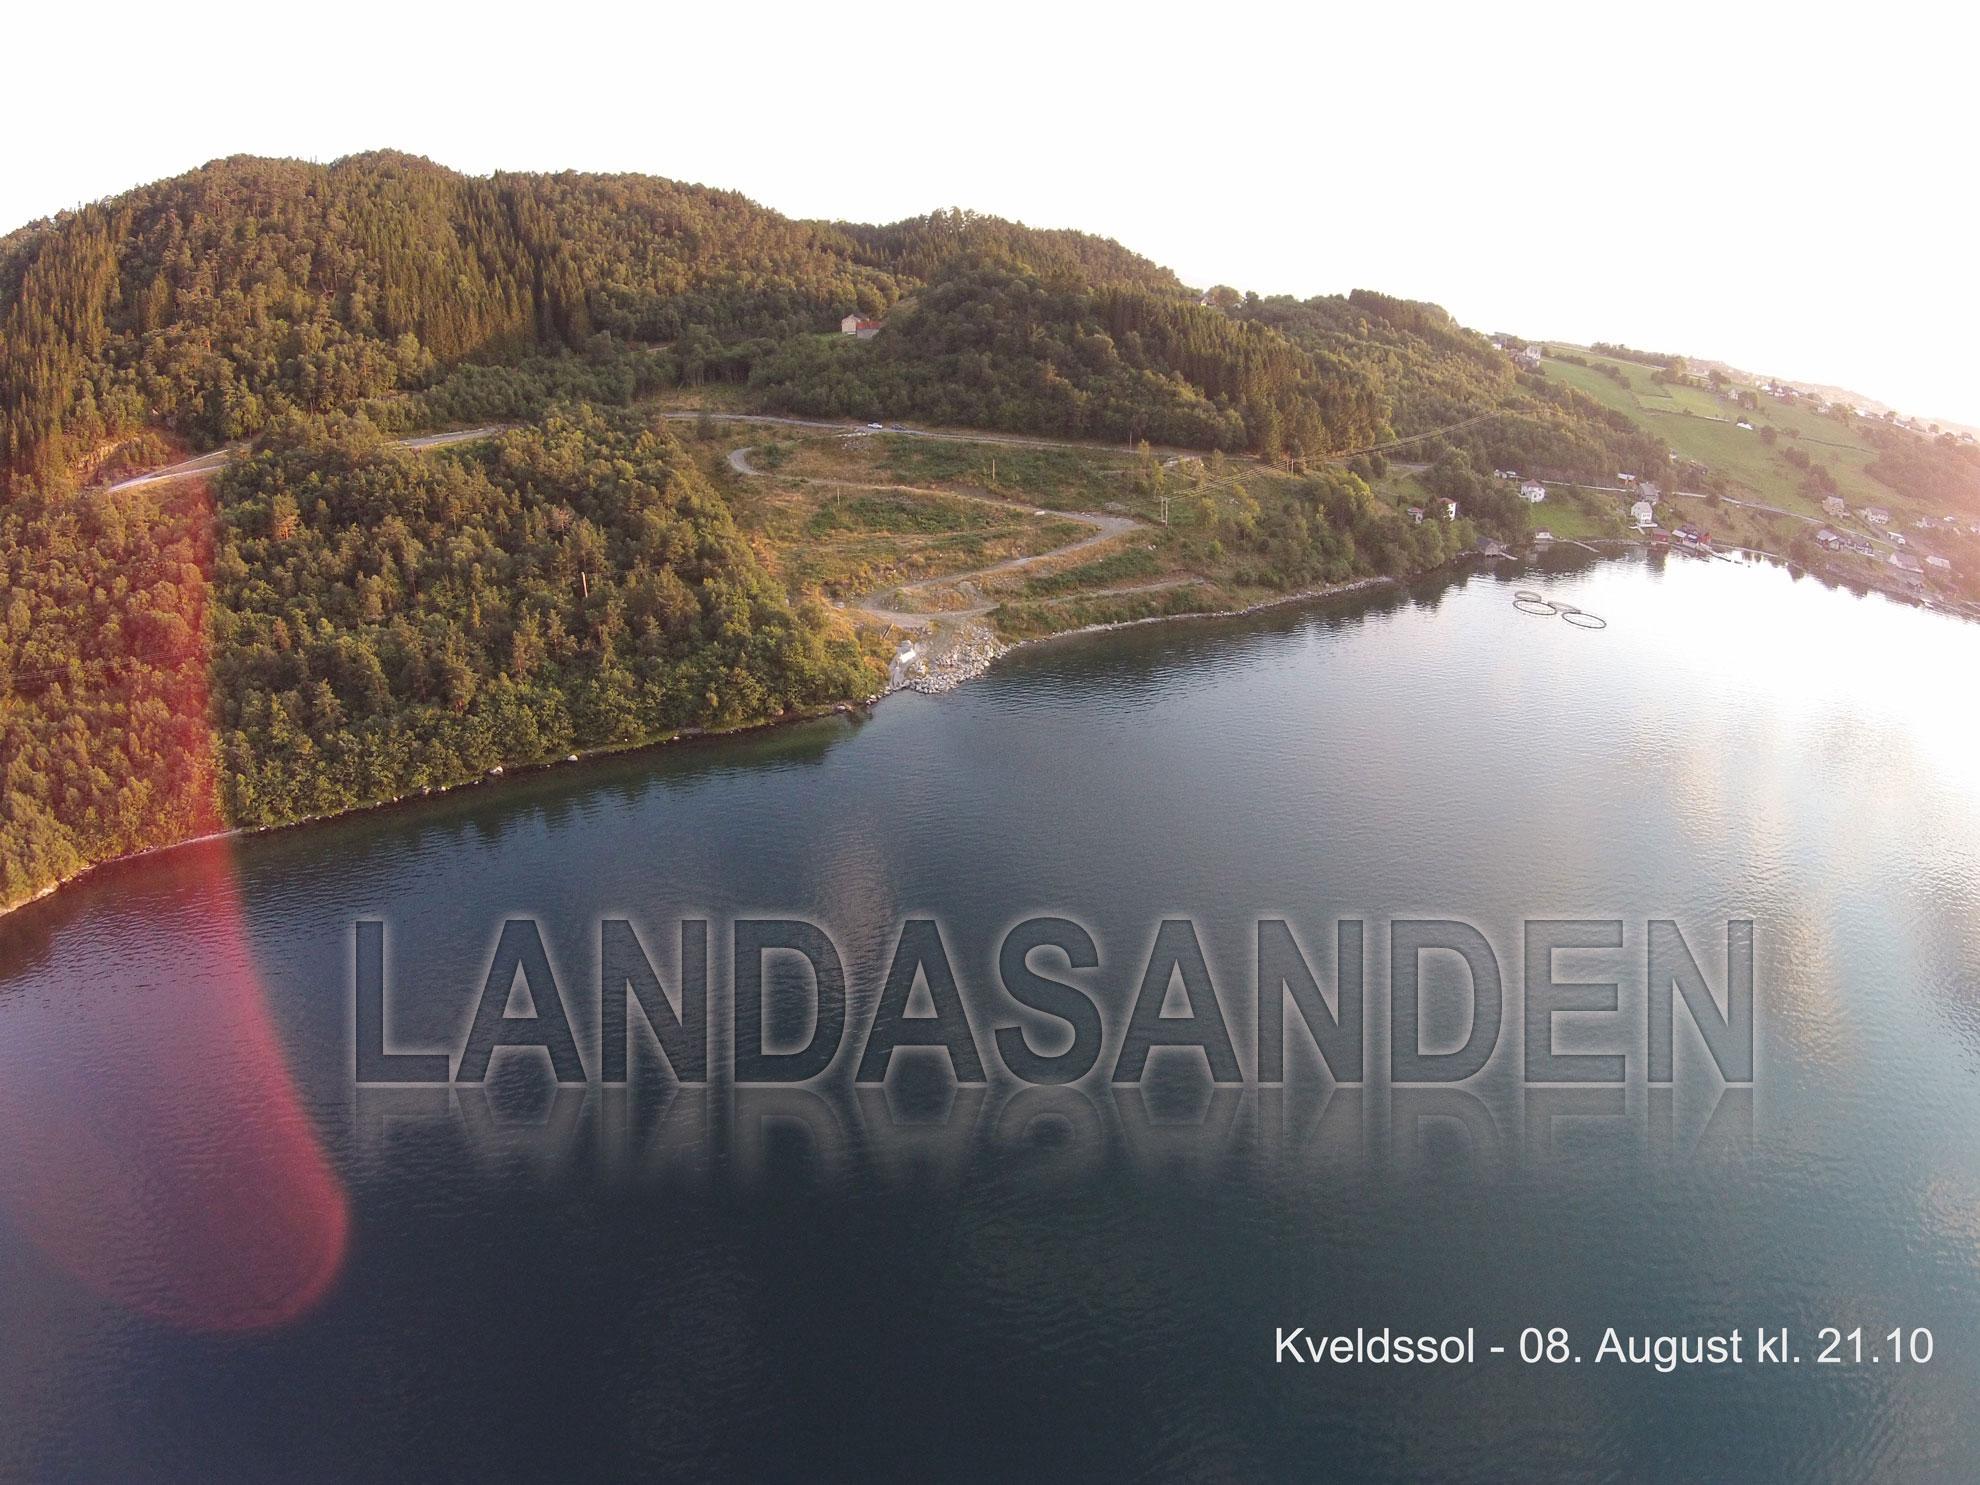 Landasanden/Landasanden_Kveldssol_glow.jpg